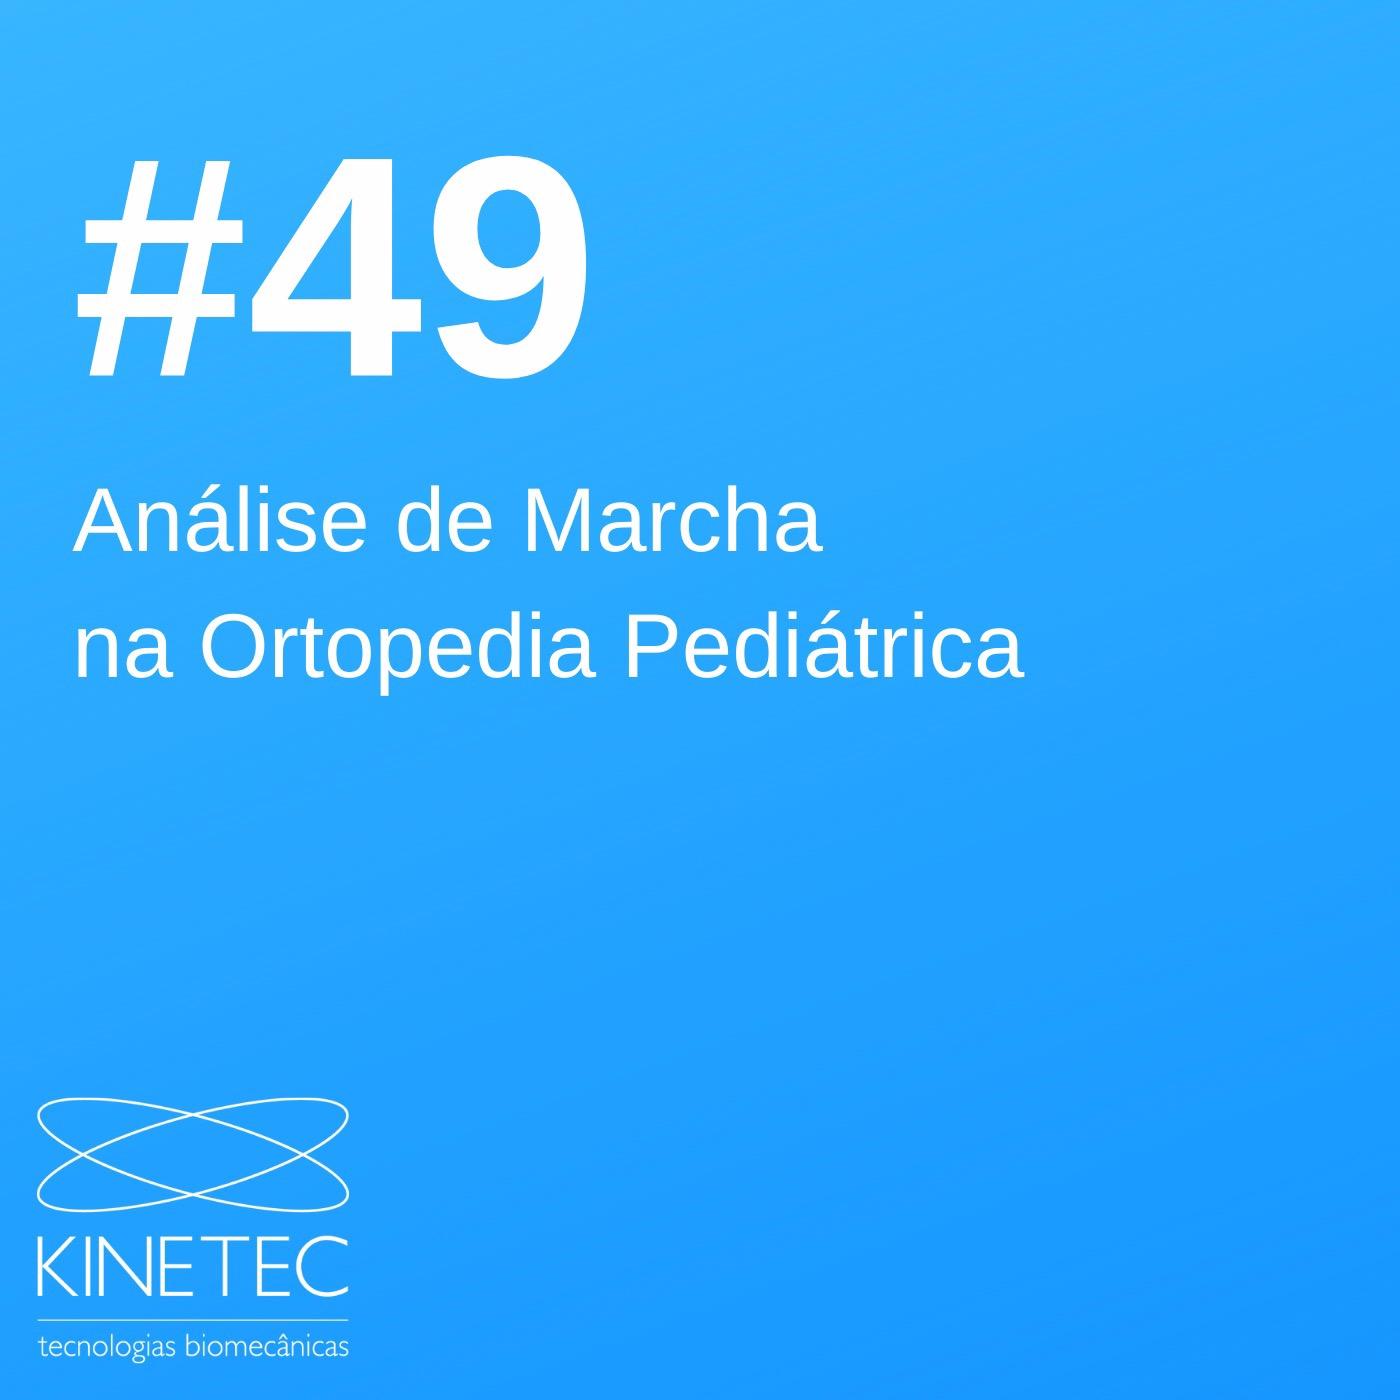 #49 Análise de Marcha na Ortopedia Pediátrica